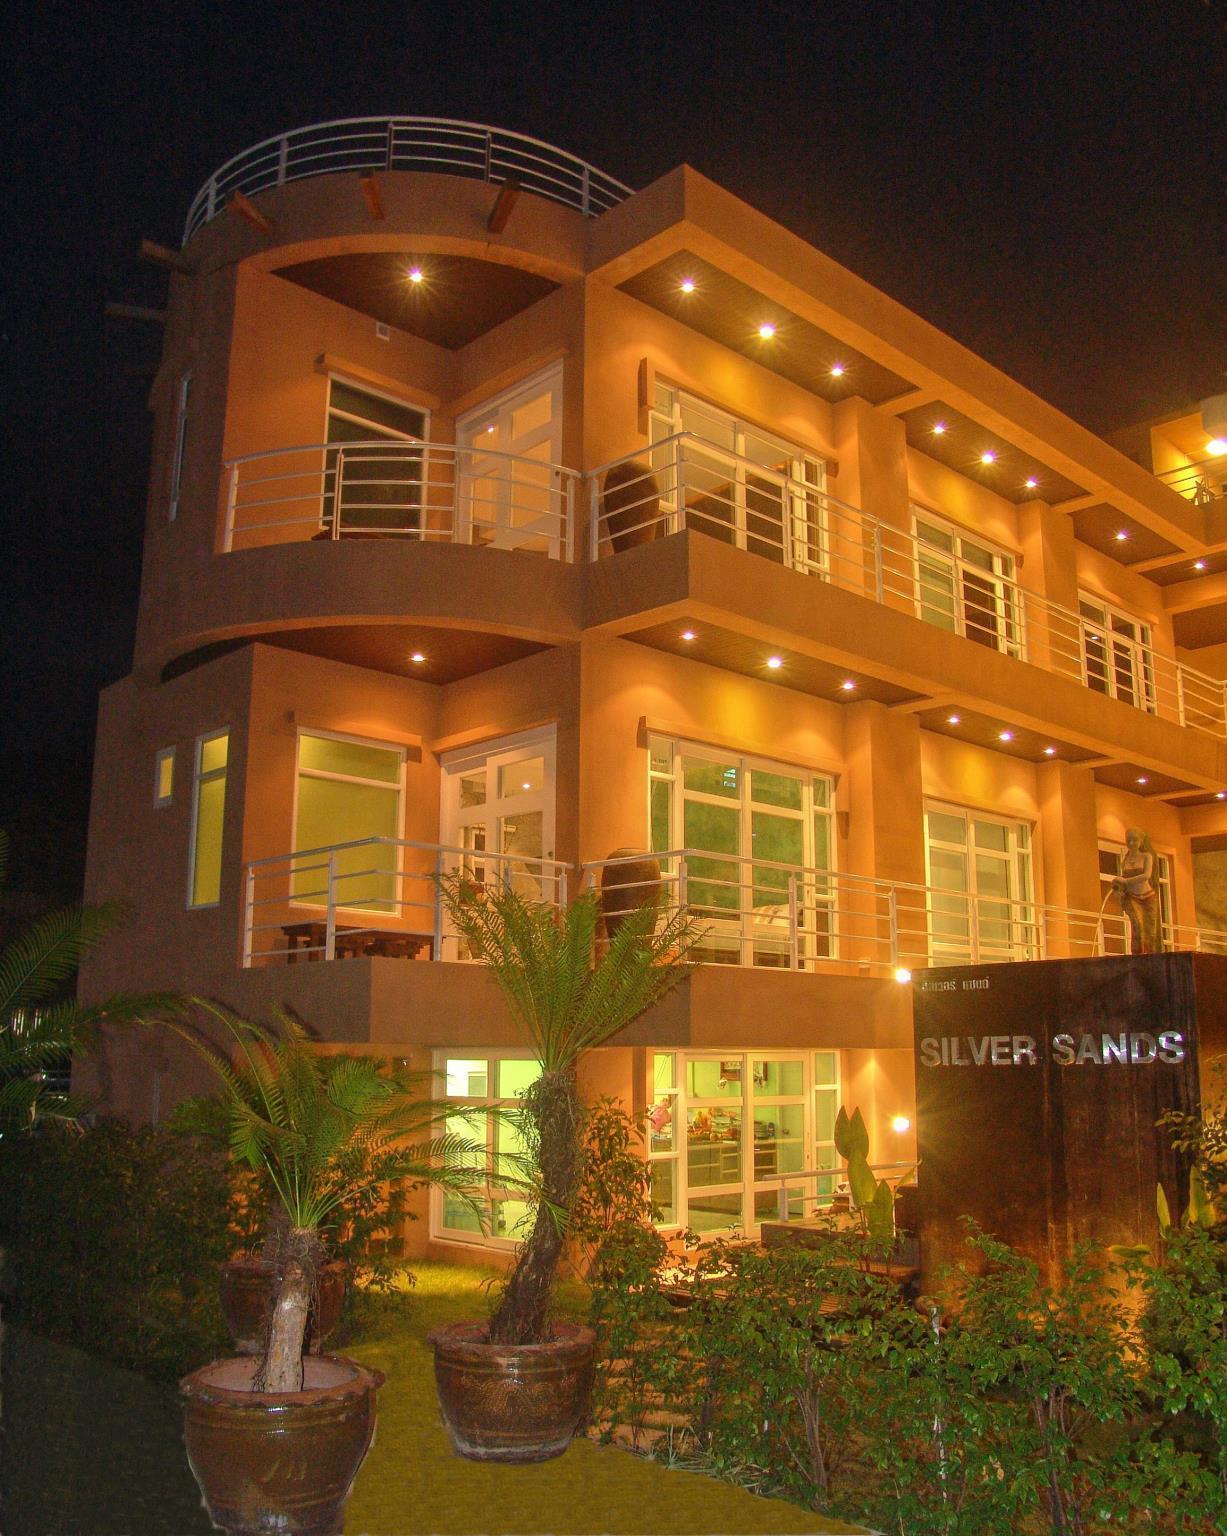 Silver Sands Beach Resort ซิลเวอร์ แซนด์ บีช รีสอร์ต